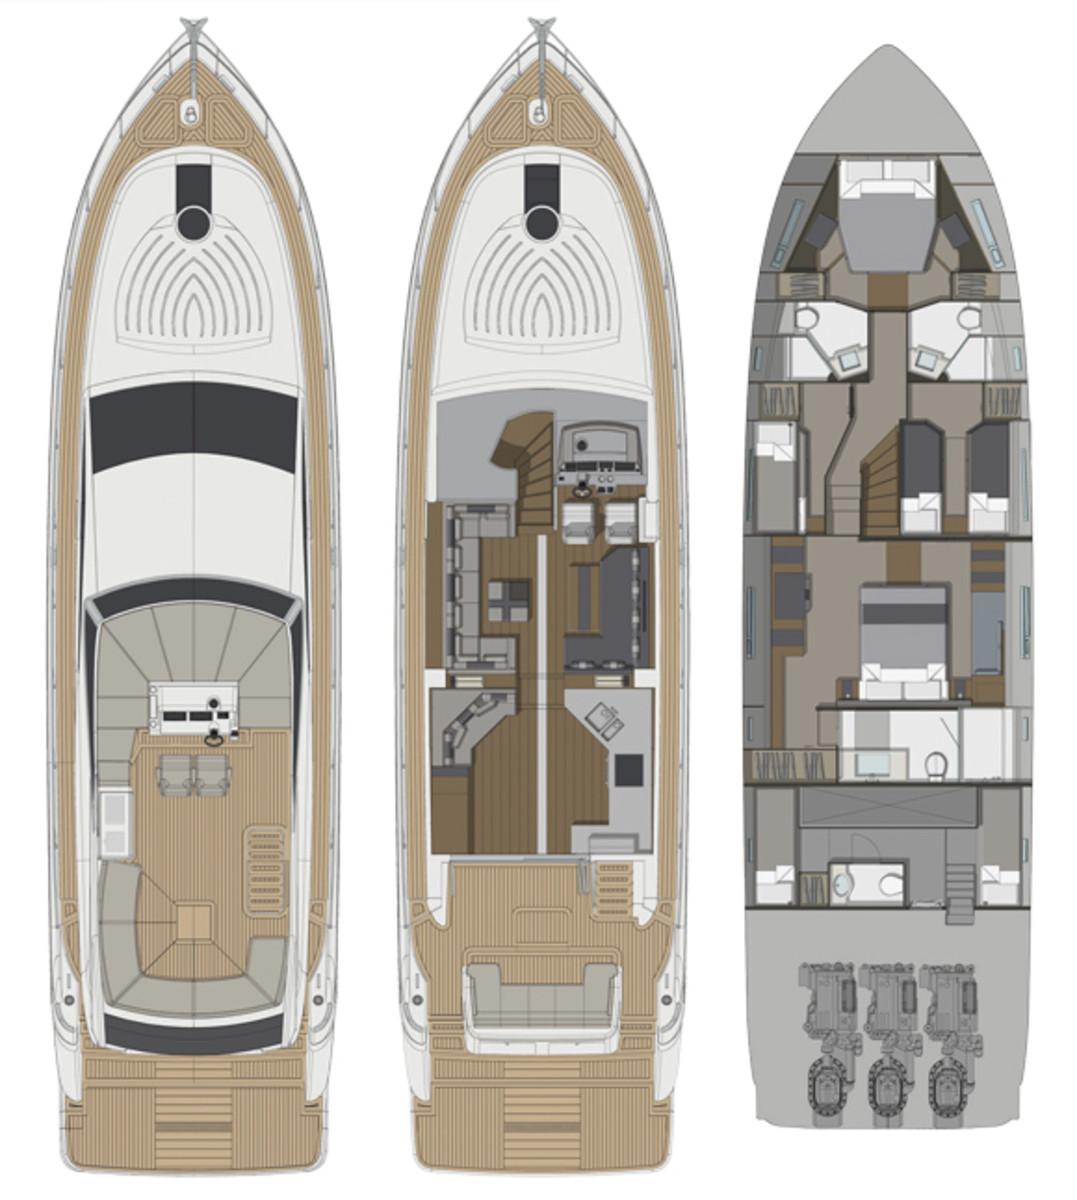 Pearl 65 motoryacht - layout diagram